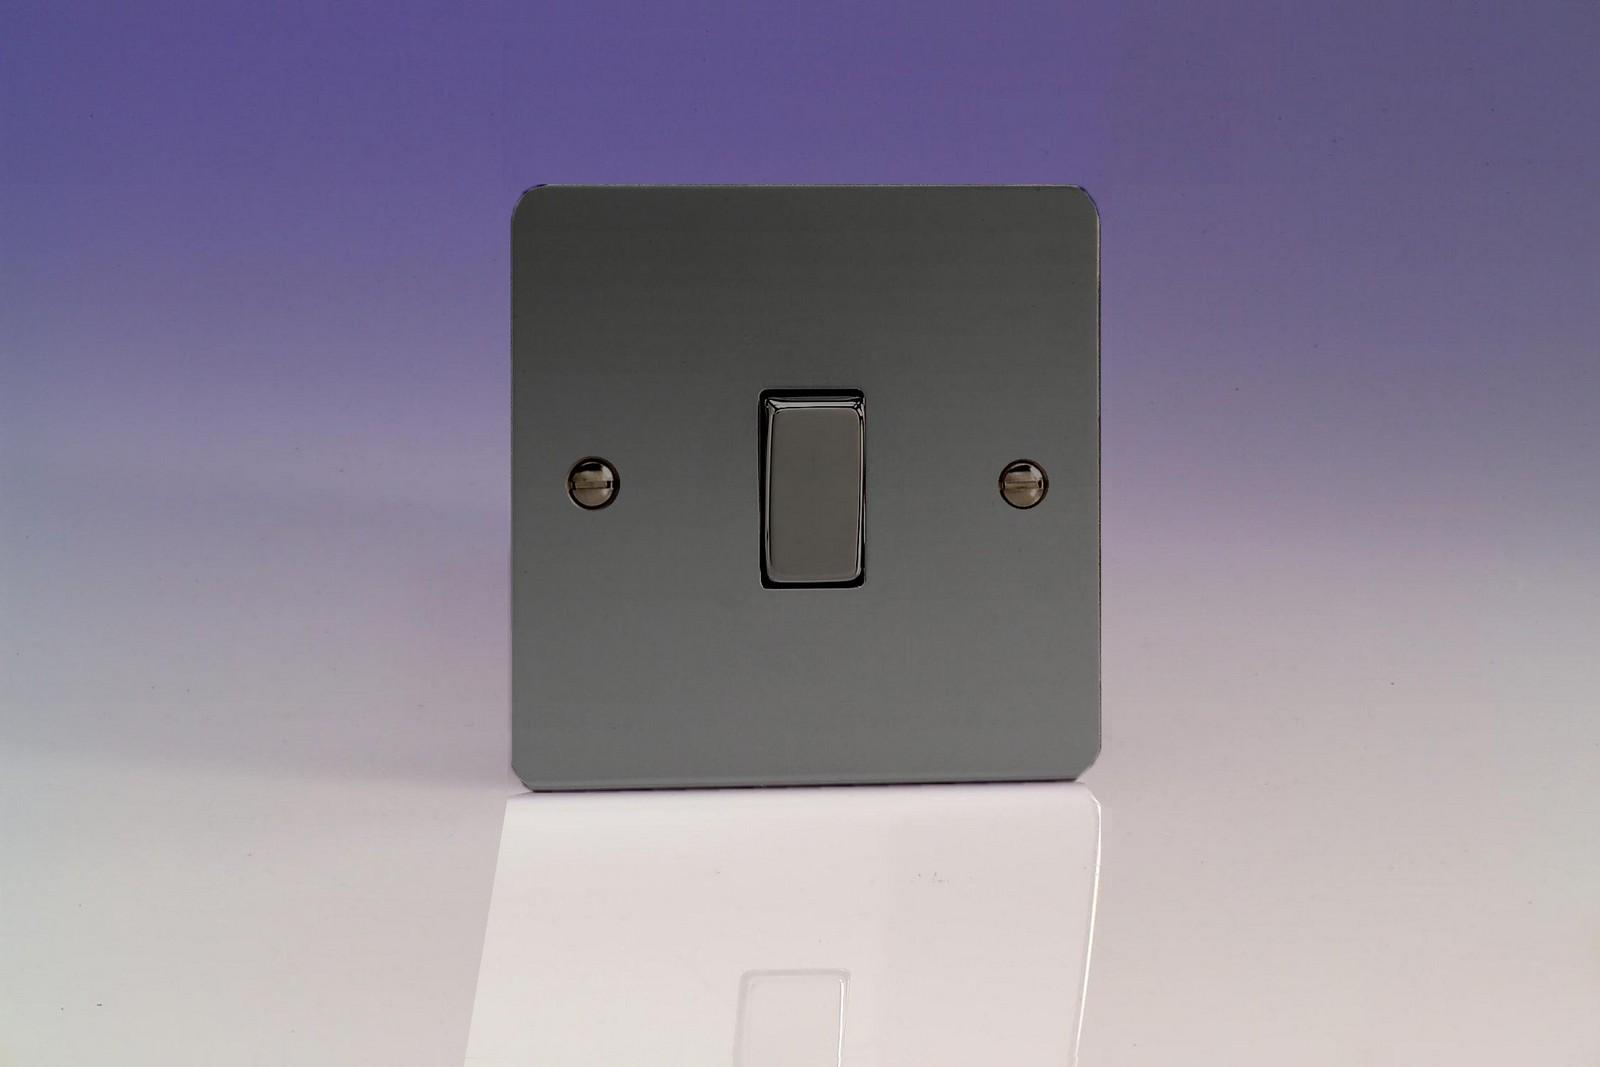 Wiring A Light Toggle Switch